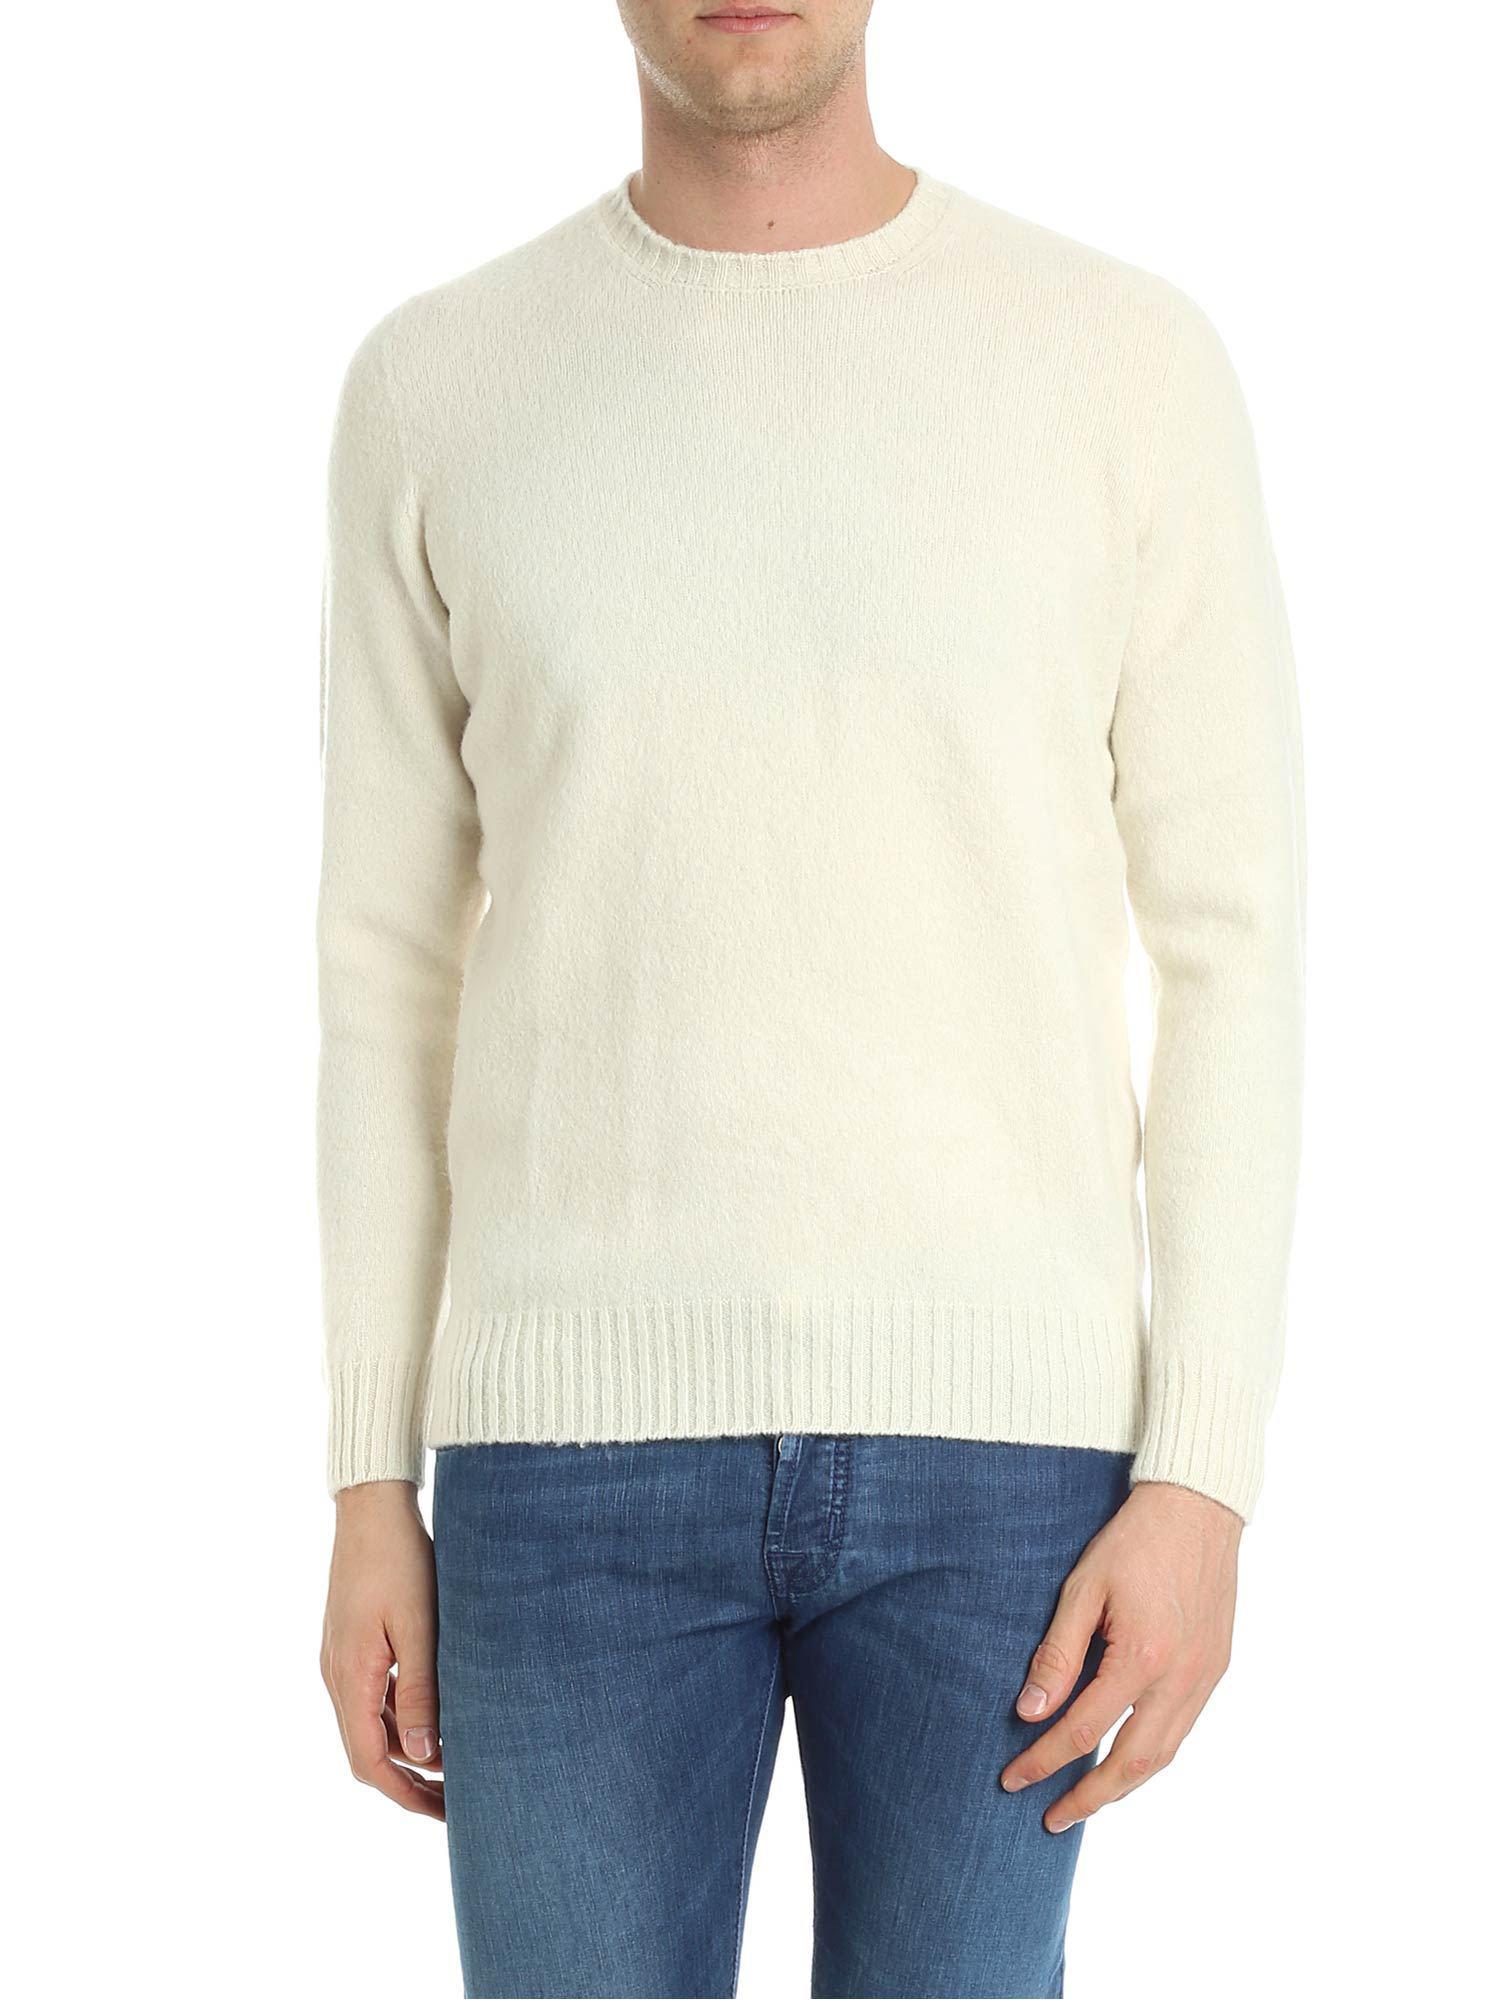 Wool Drumohr Lyst Lamb For Pullover In Men White qtwgfvwR1